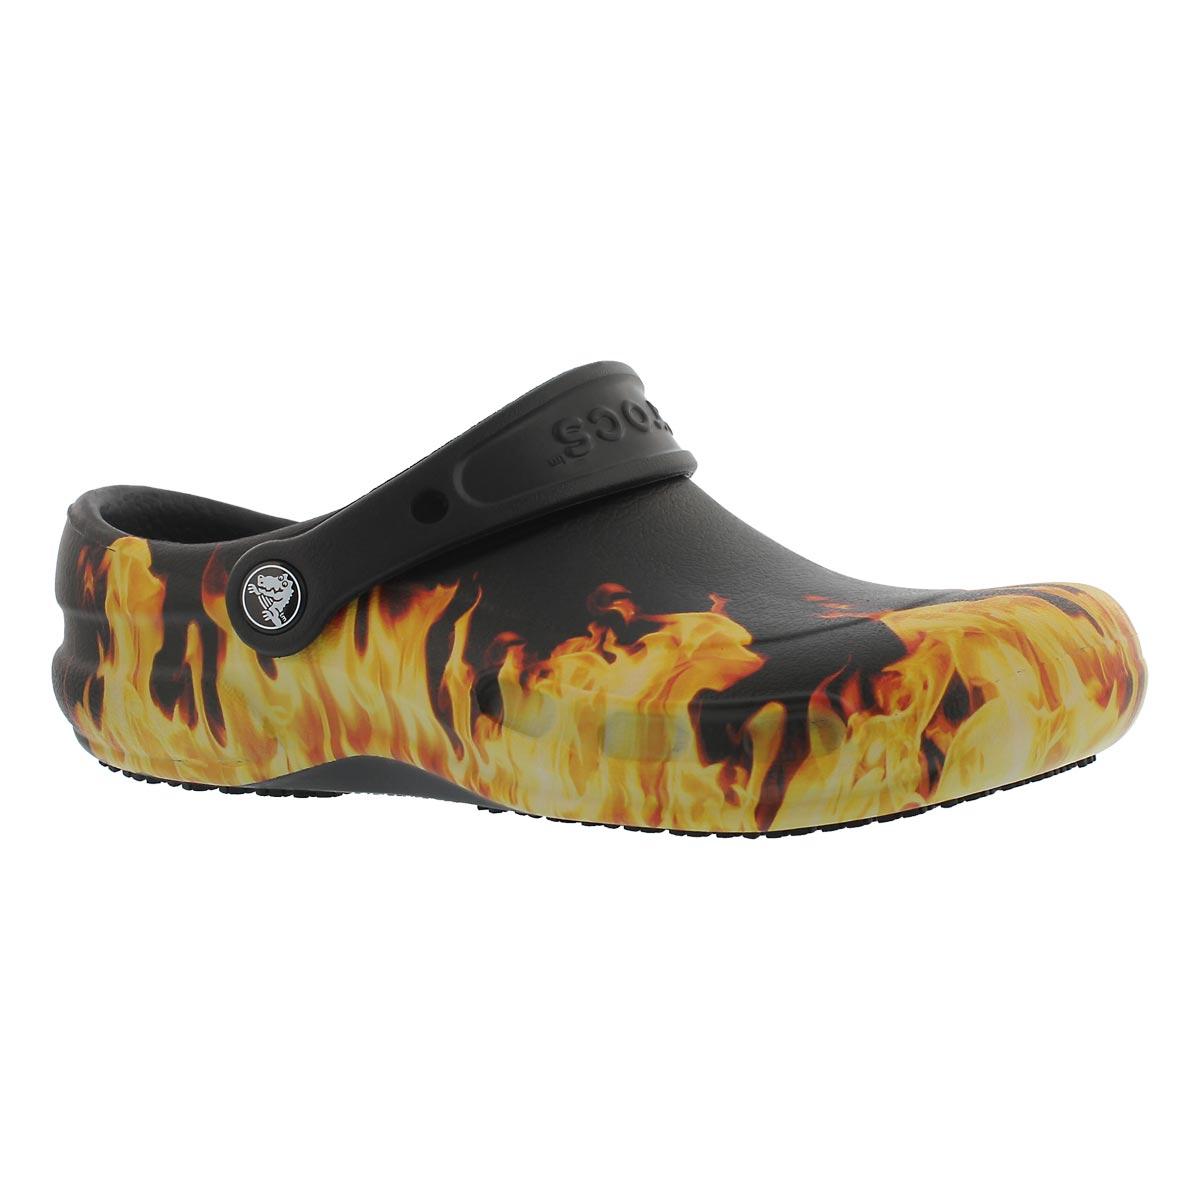 Unisex BISTRO GRAPHIC black flames clogs